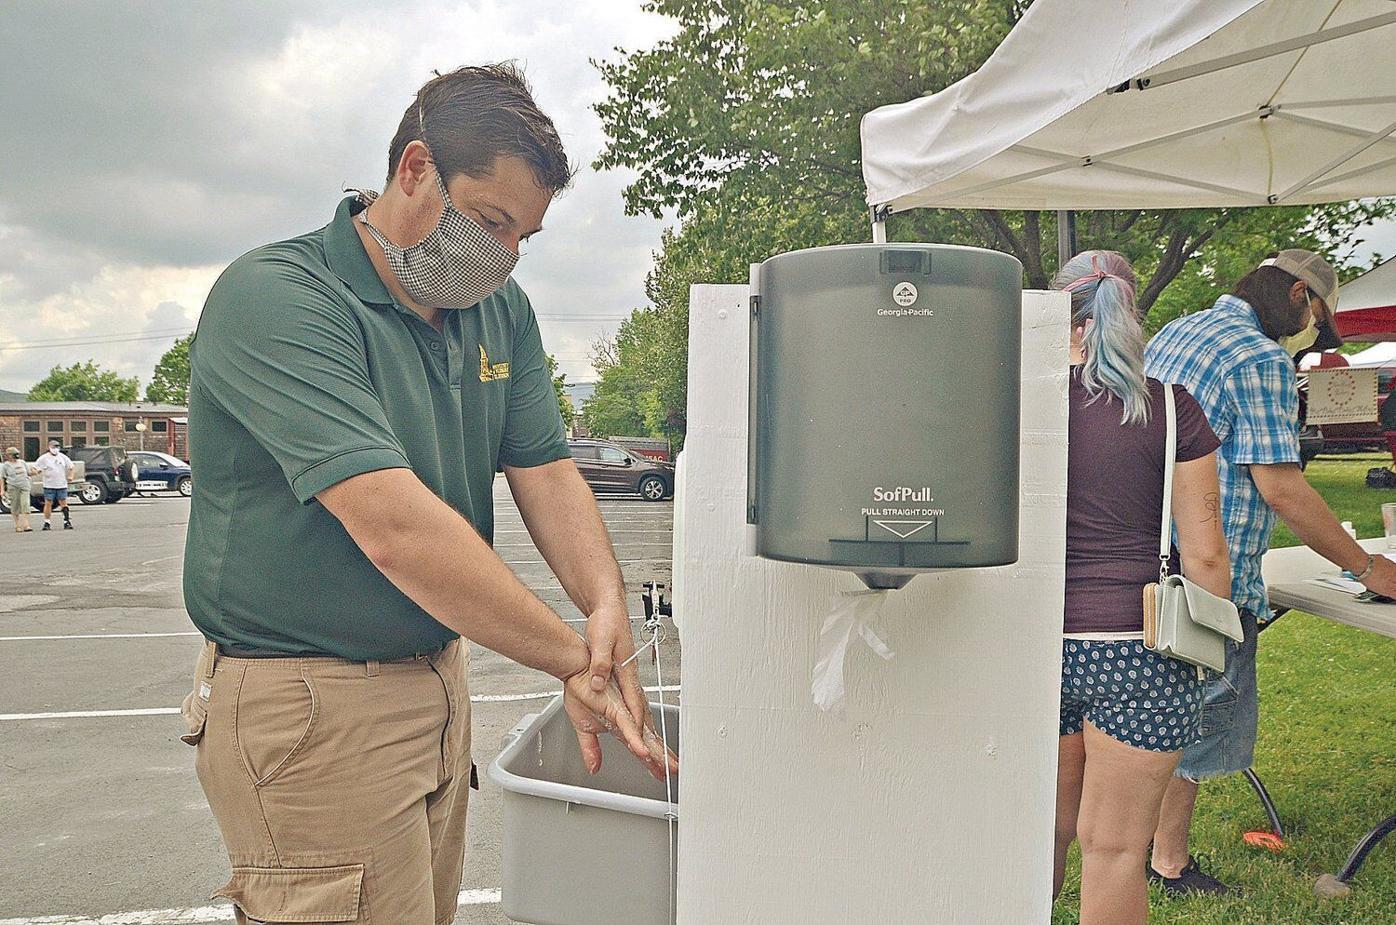 Hand-washing station makes impression at Farmers Market